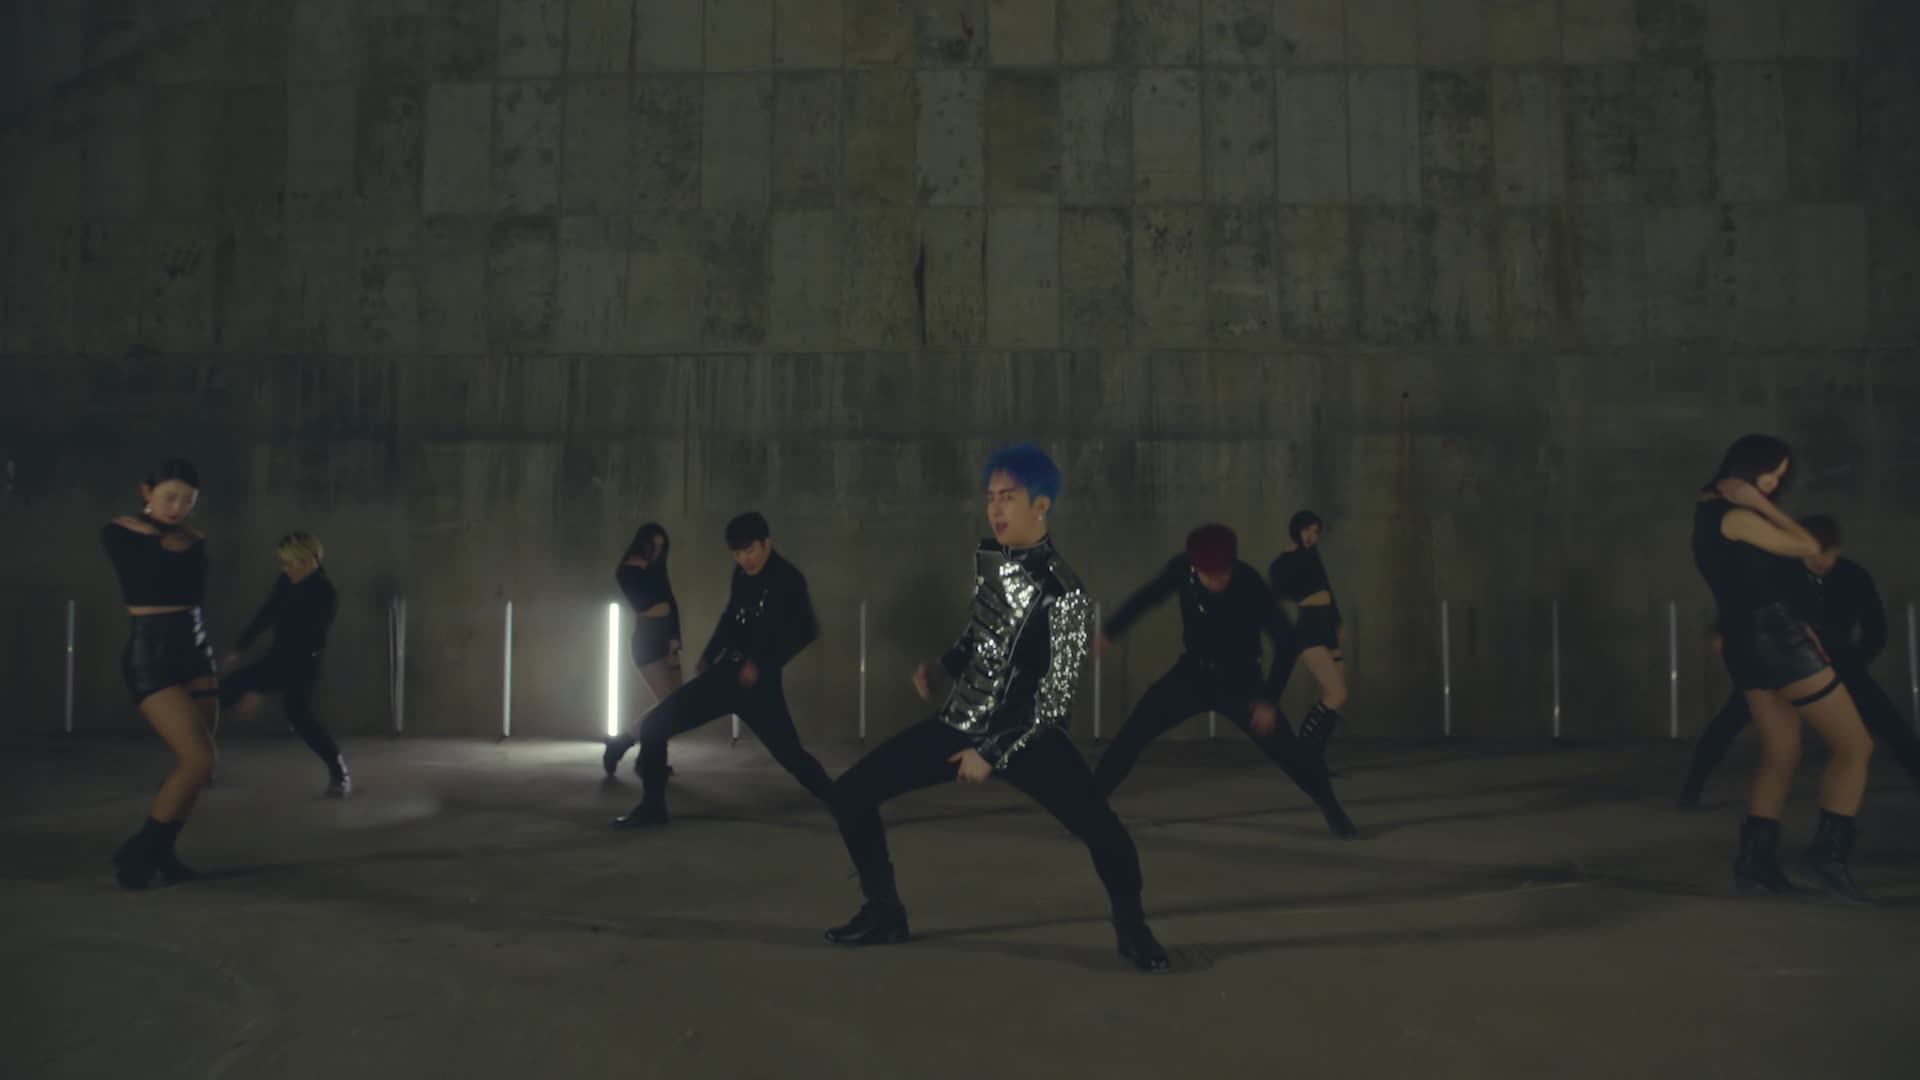 (Official MV)김형준KIMHYUNGJUN_스냅샷(Snapshot)_뮤직비디오(MusicVideo)